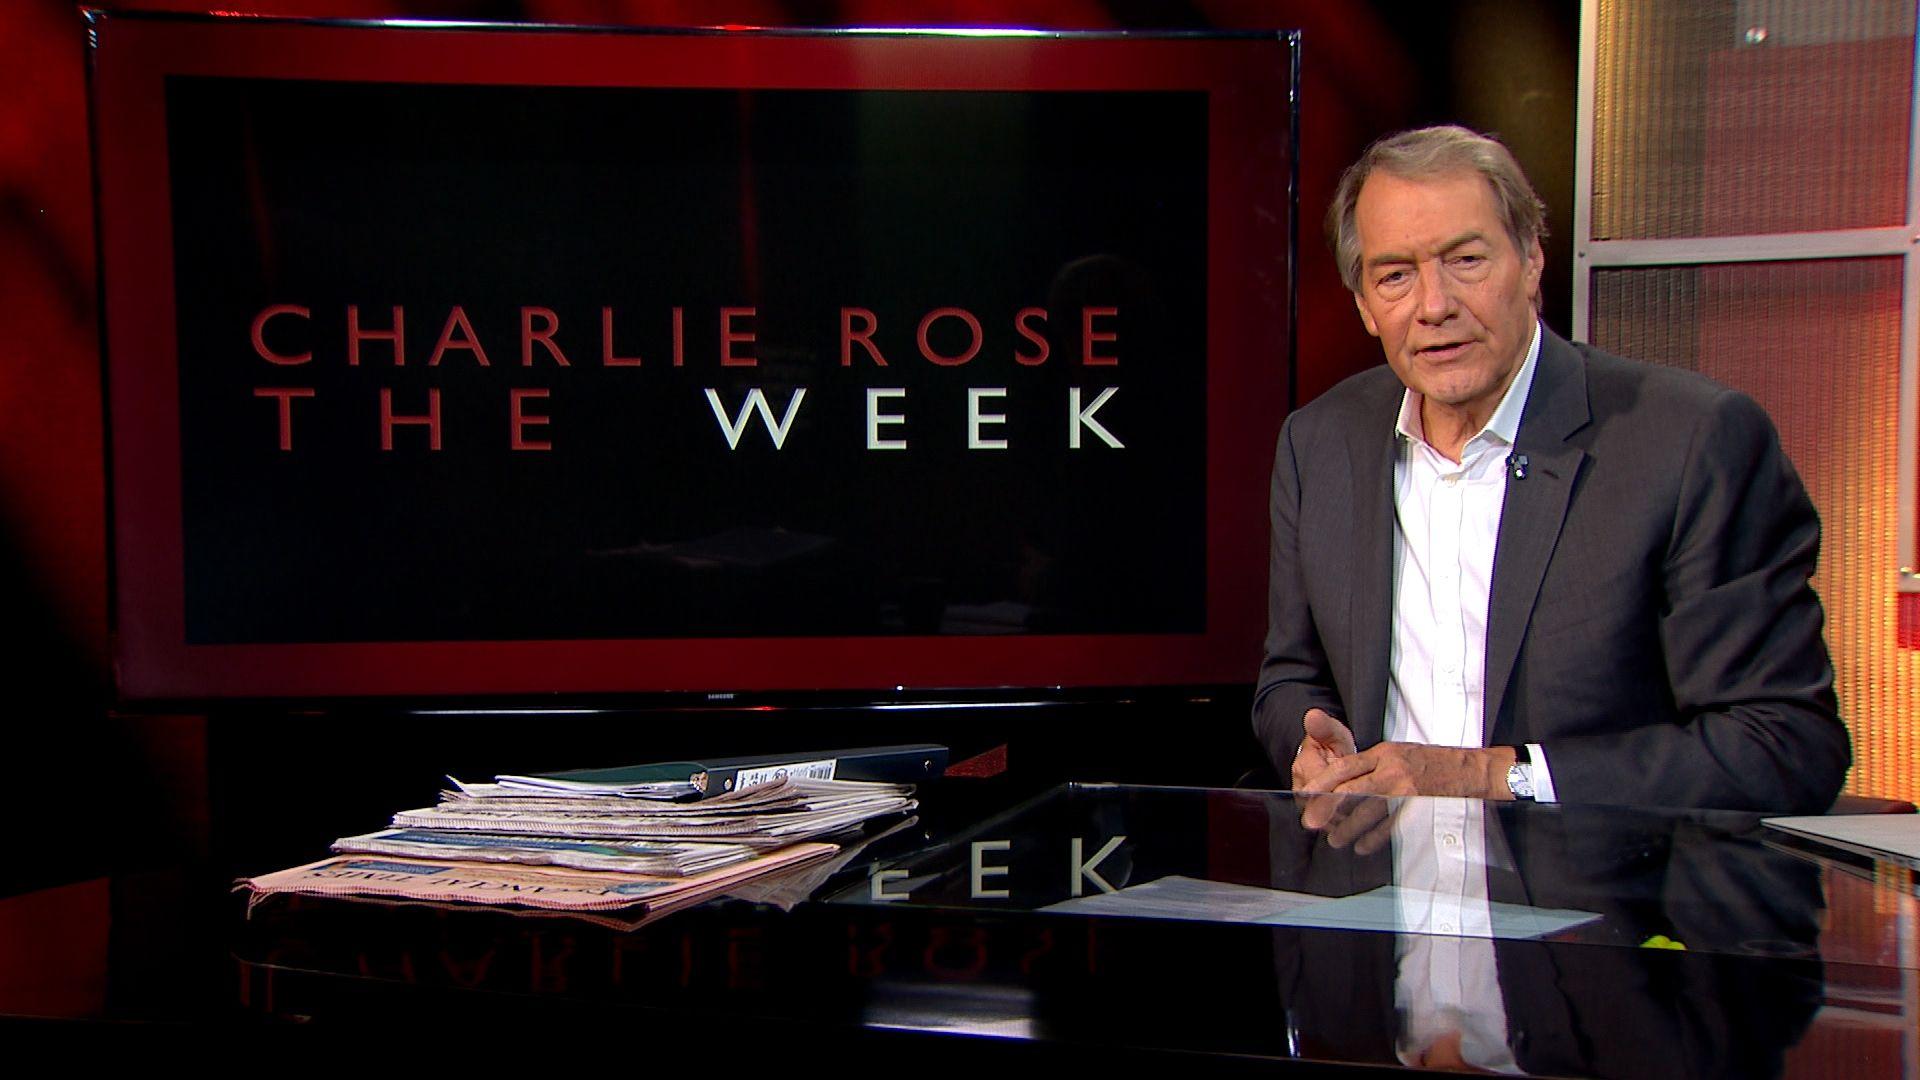 Watch now Charlie Rose The Week September 5, 2014 PBS